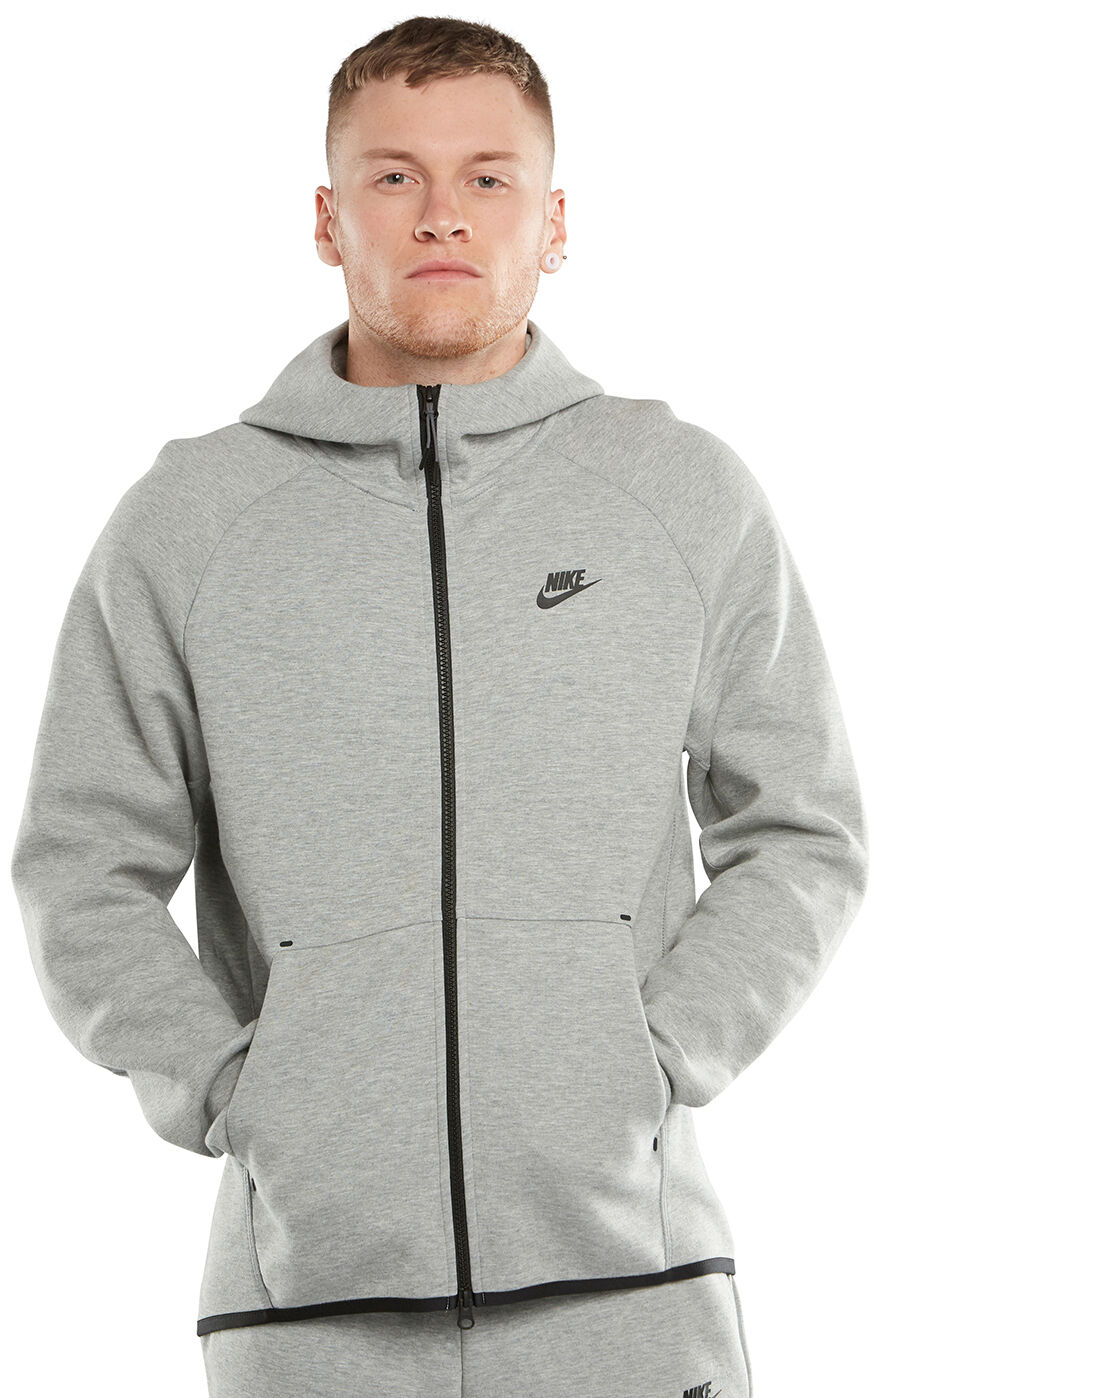 Men's Grey Nike Tech Fleece Hoodie